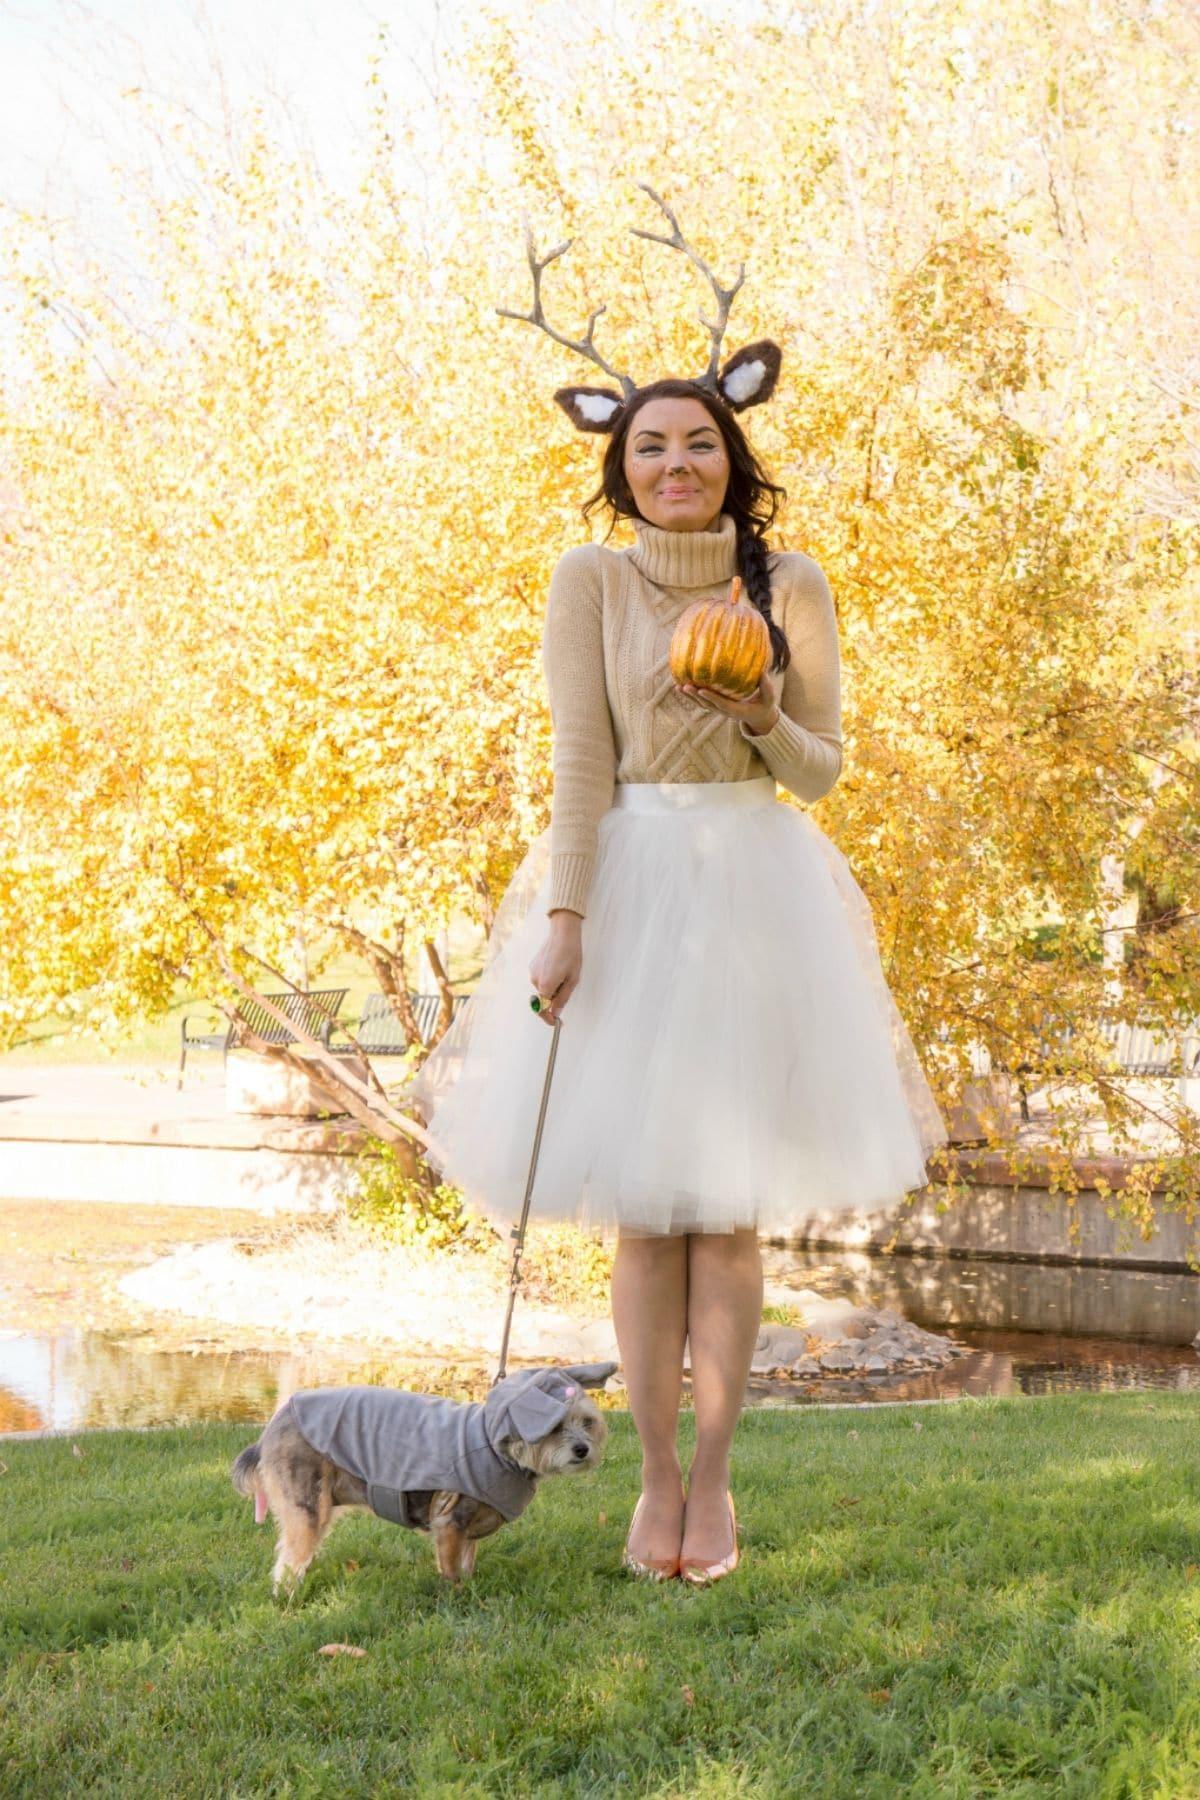 modest deer costume